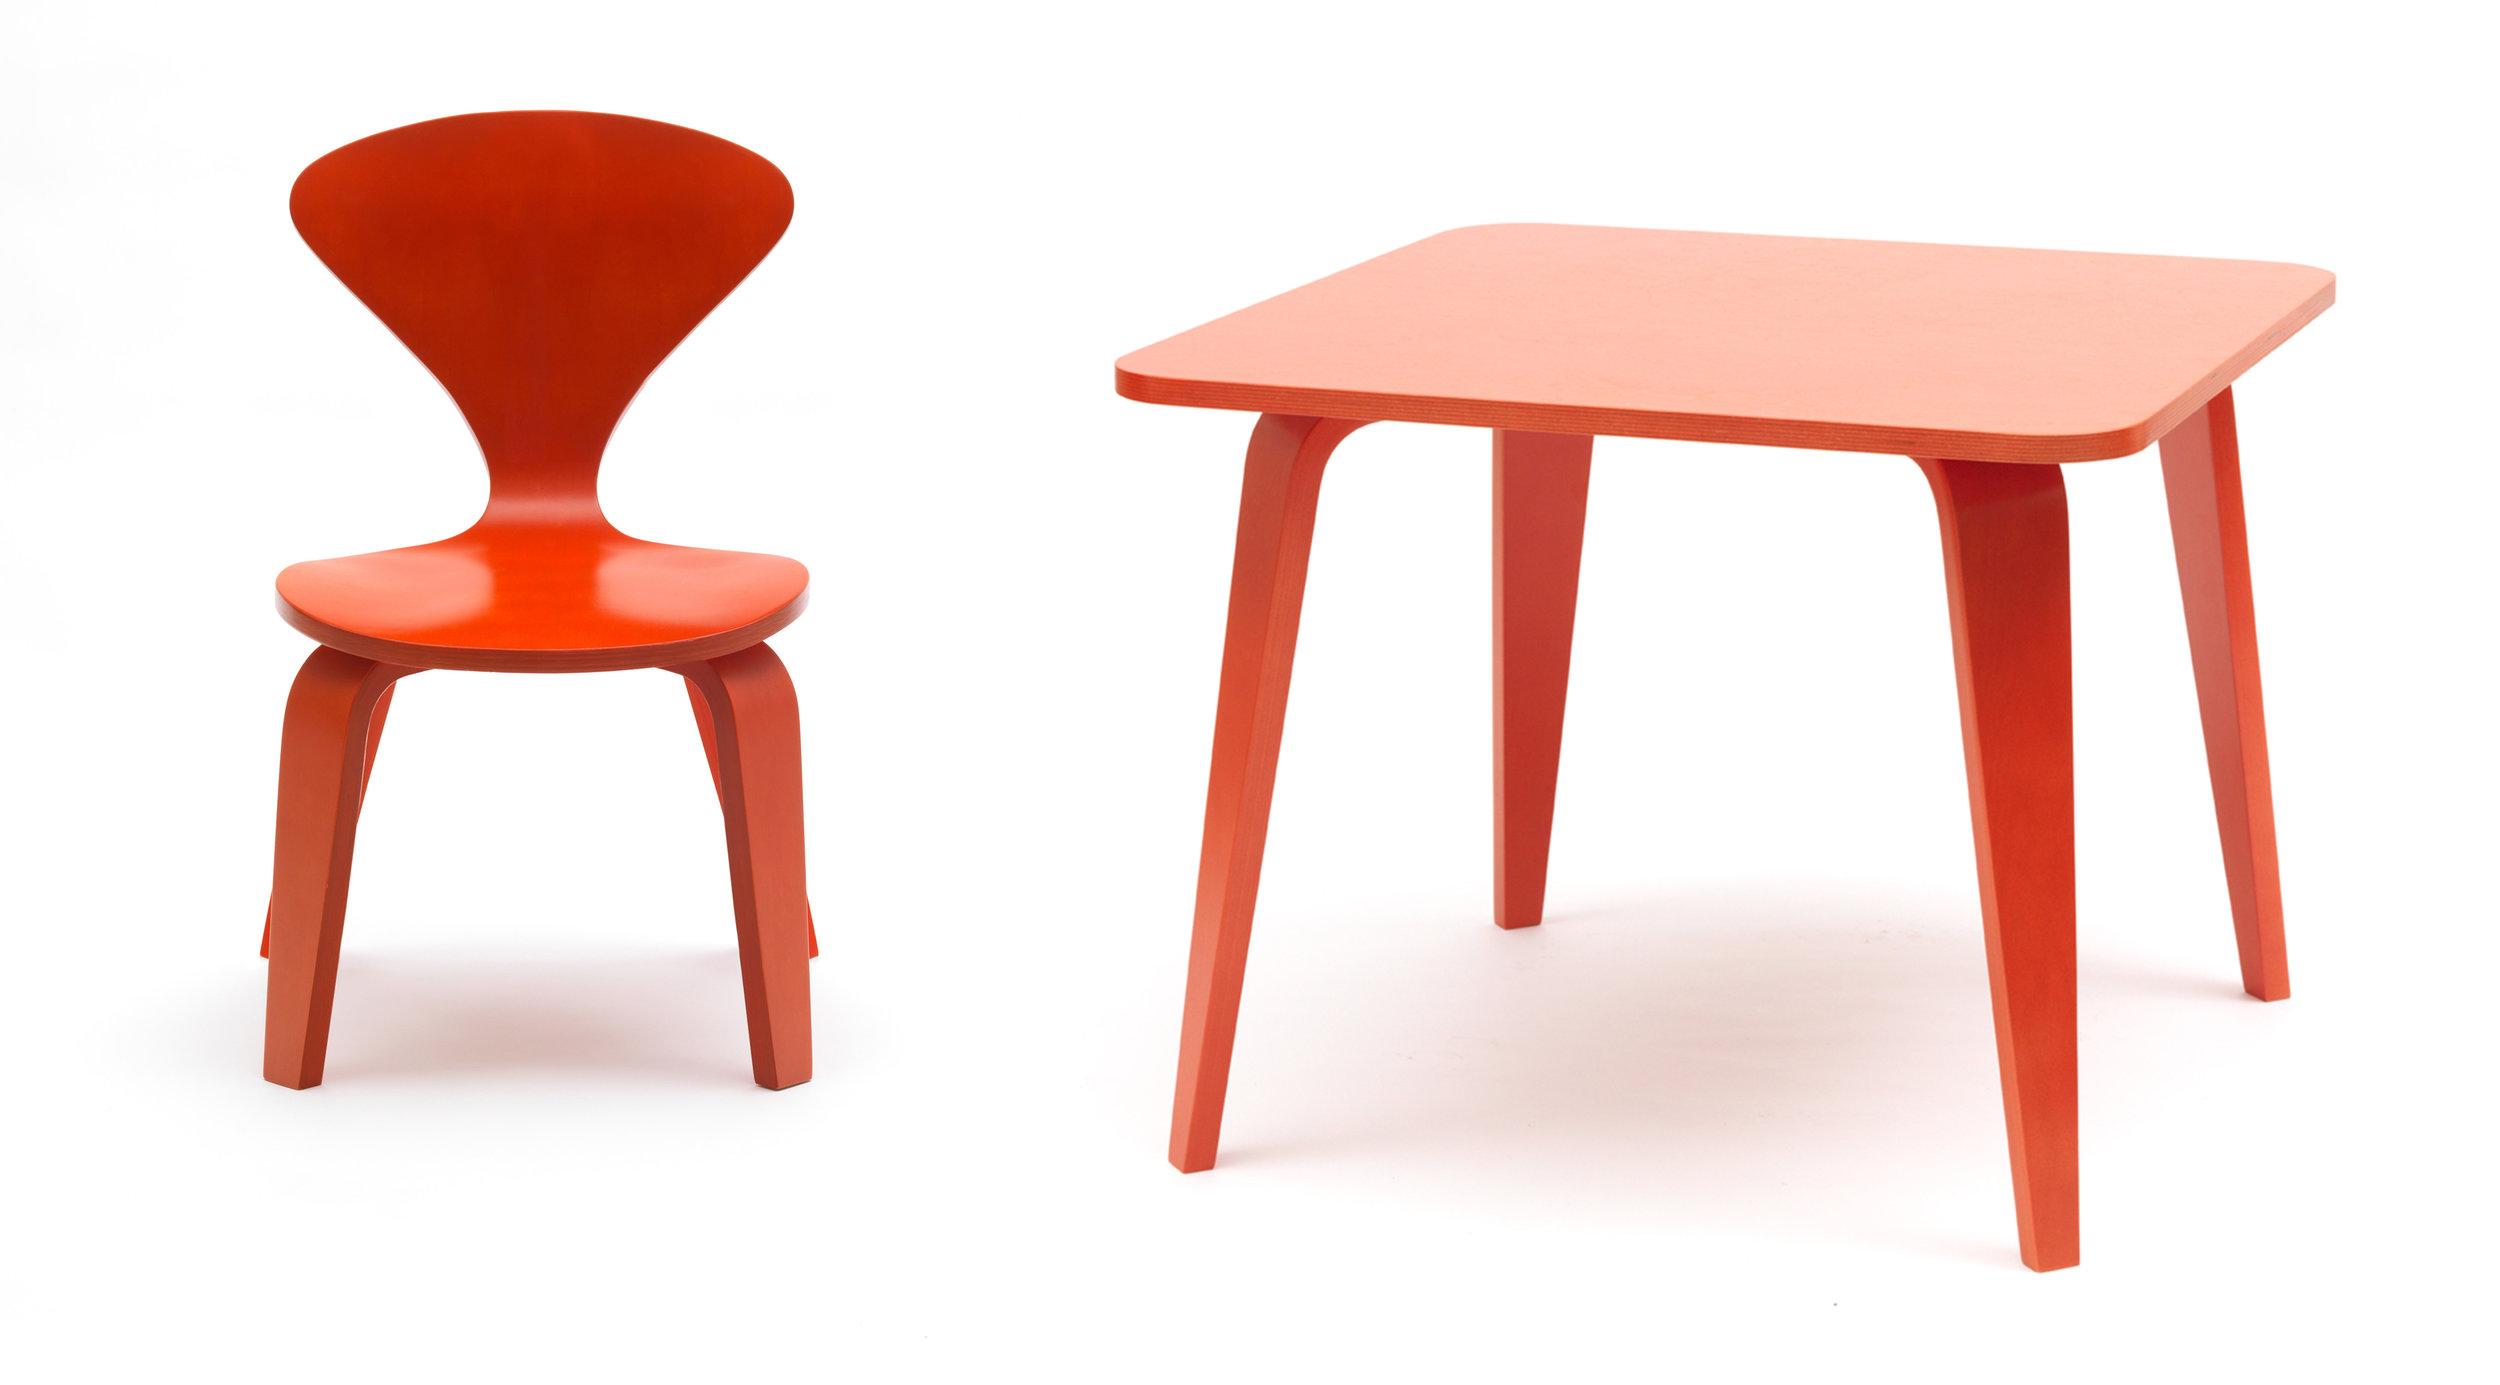 Cherner-orange-chair-and-table.jpg